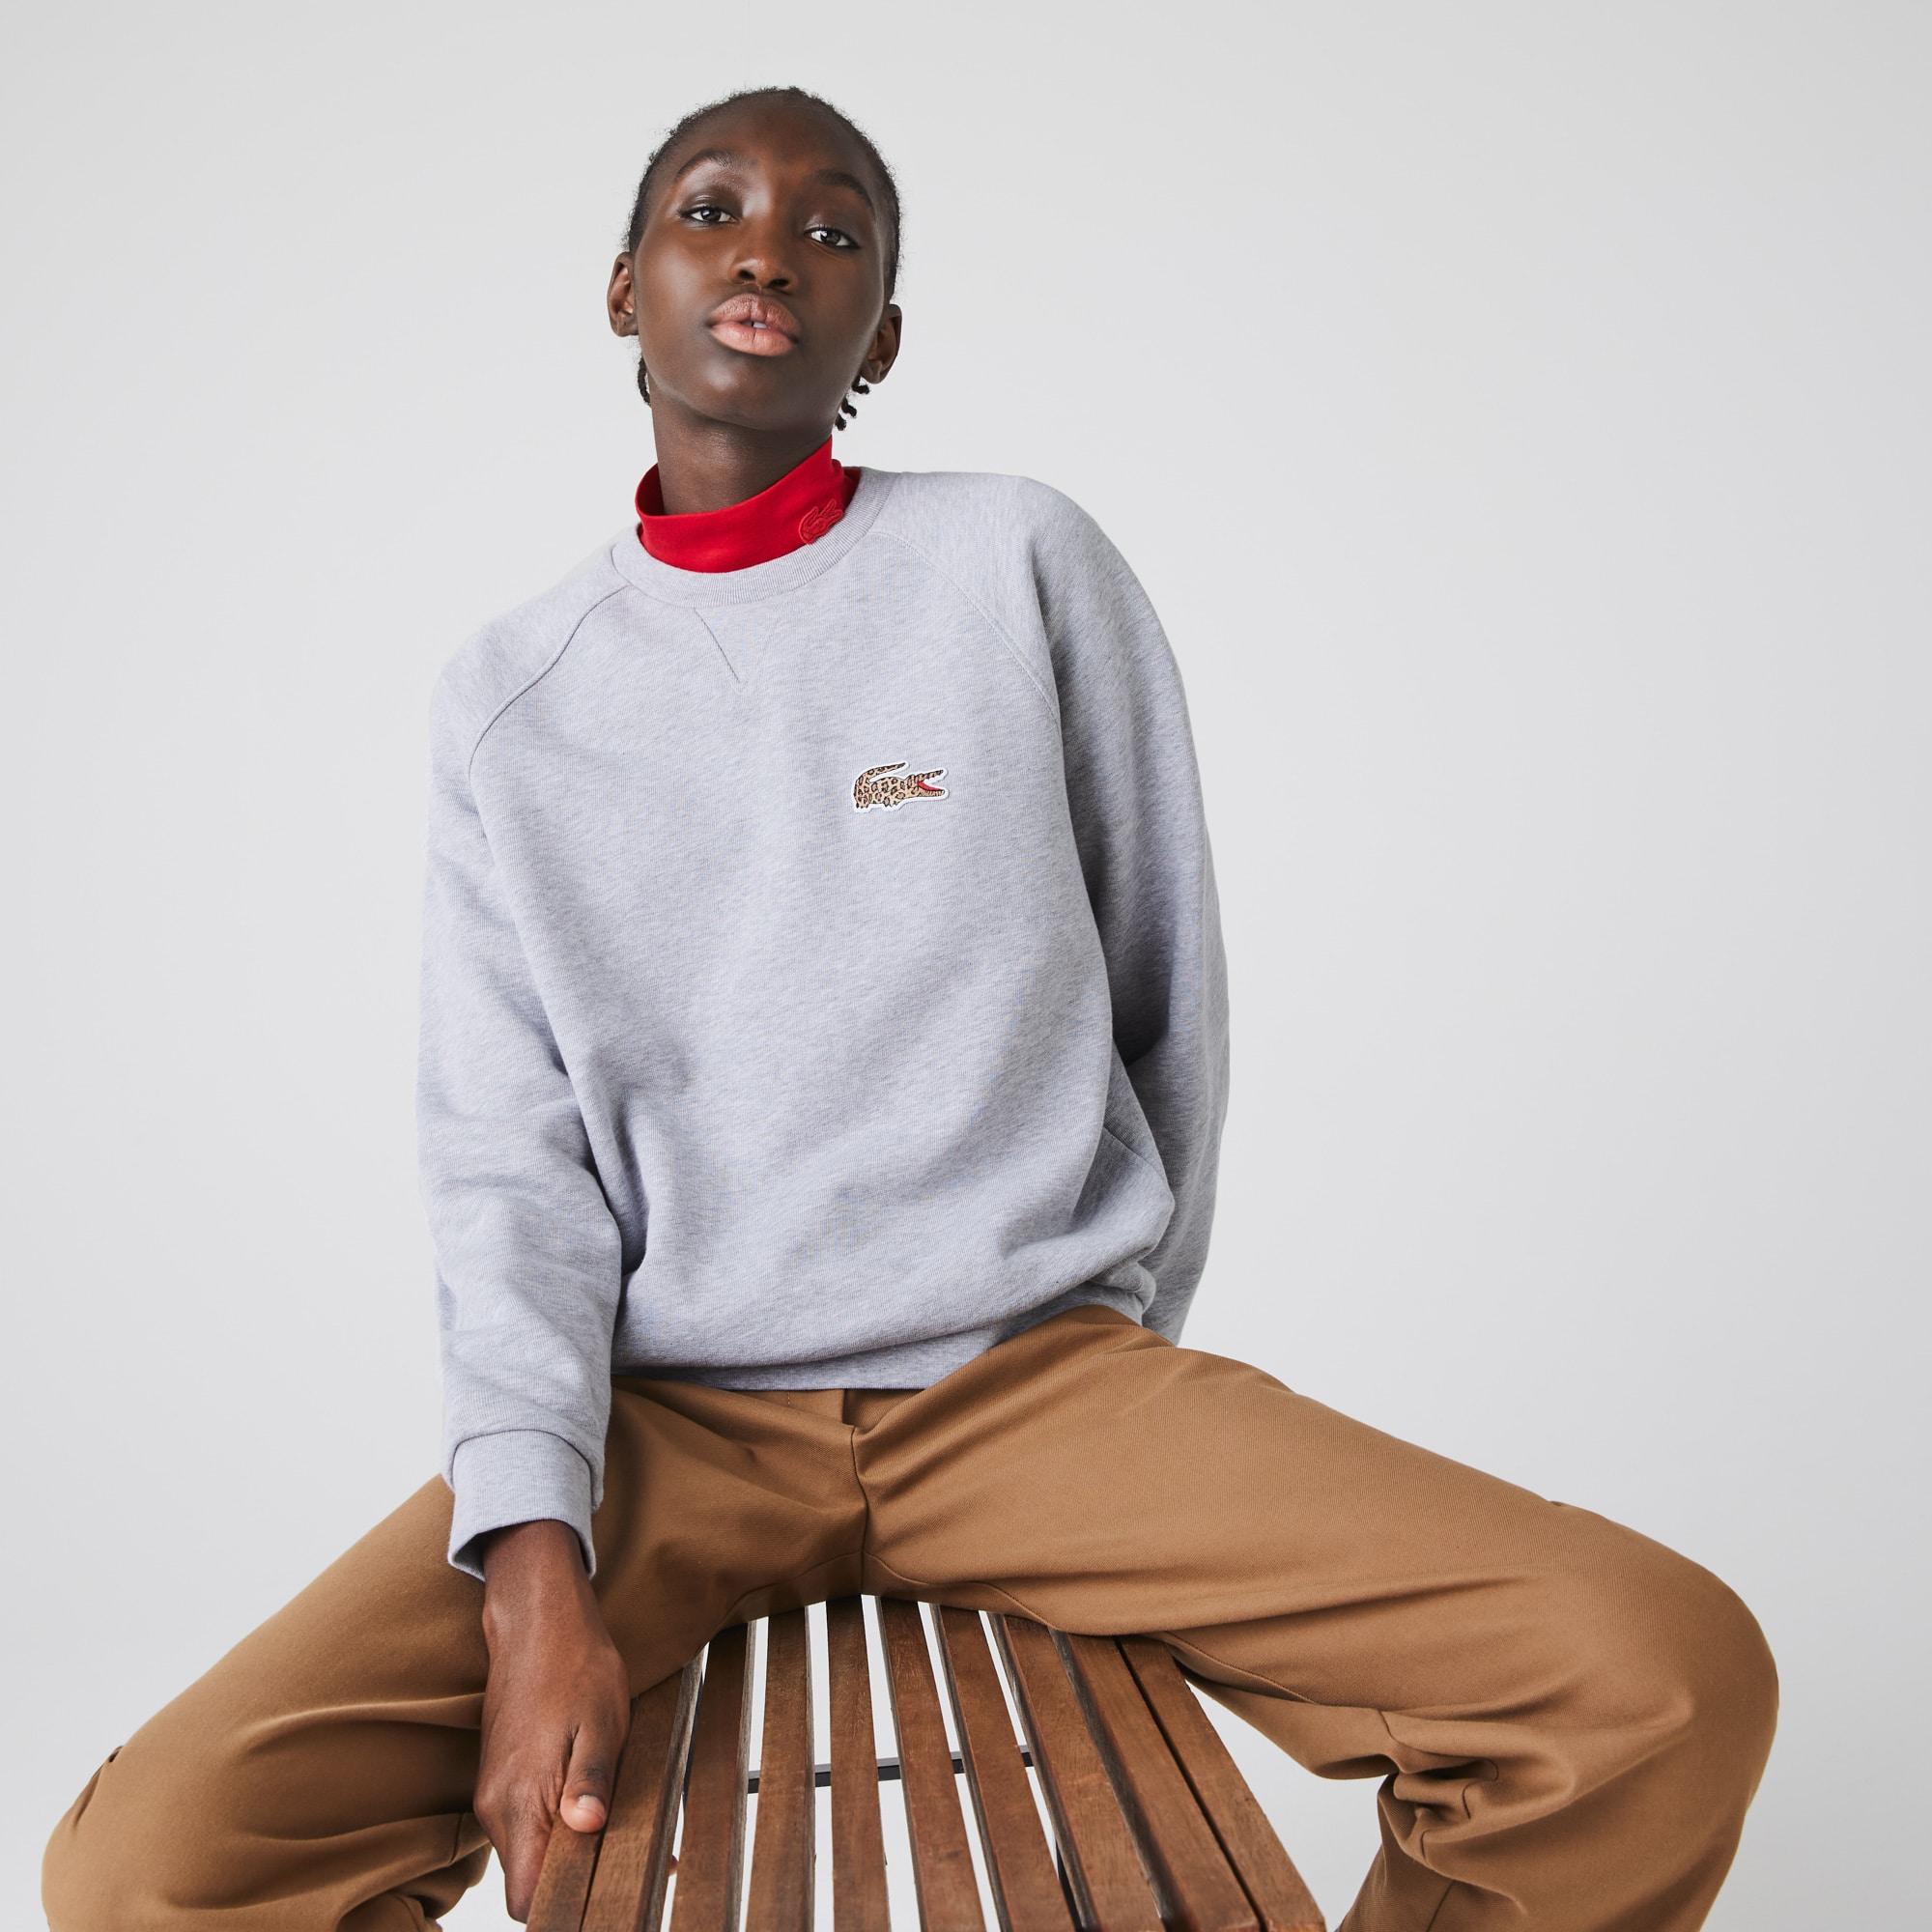 Women's 라코스테 Lacoste x National Geographic Cotton Fleece Sweatshirt